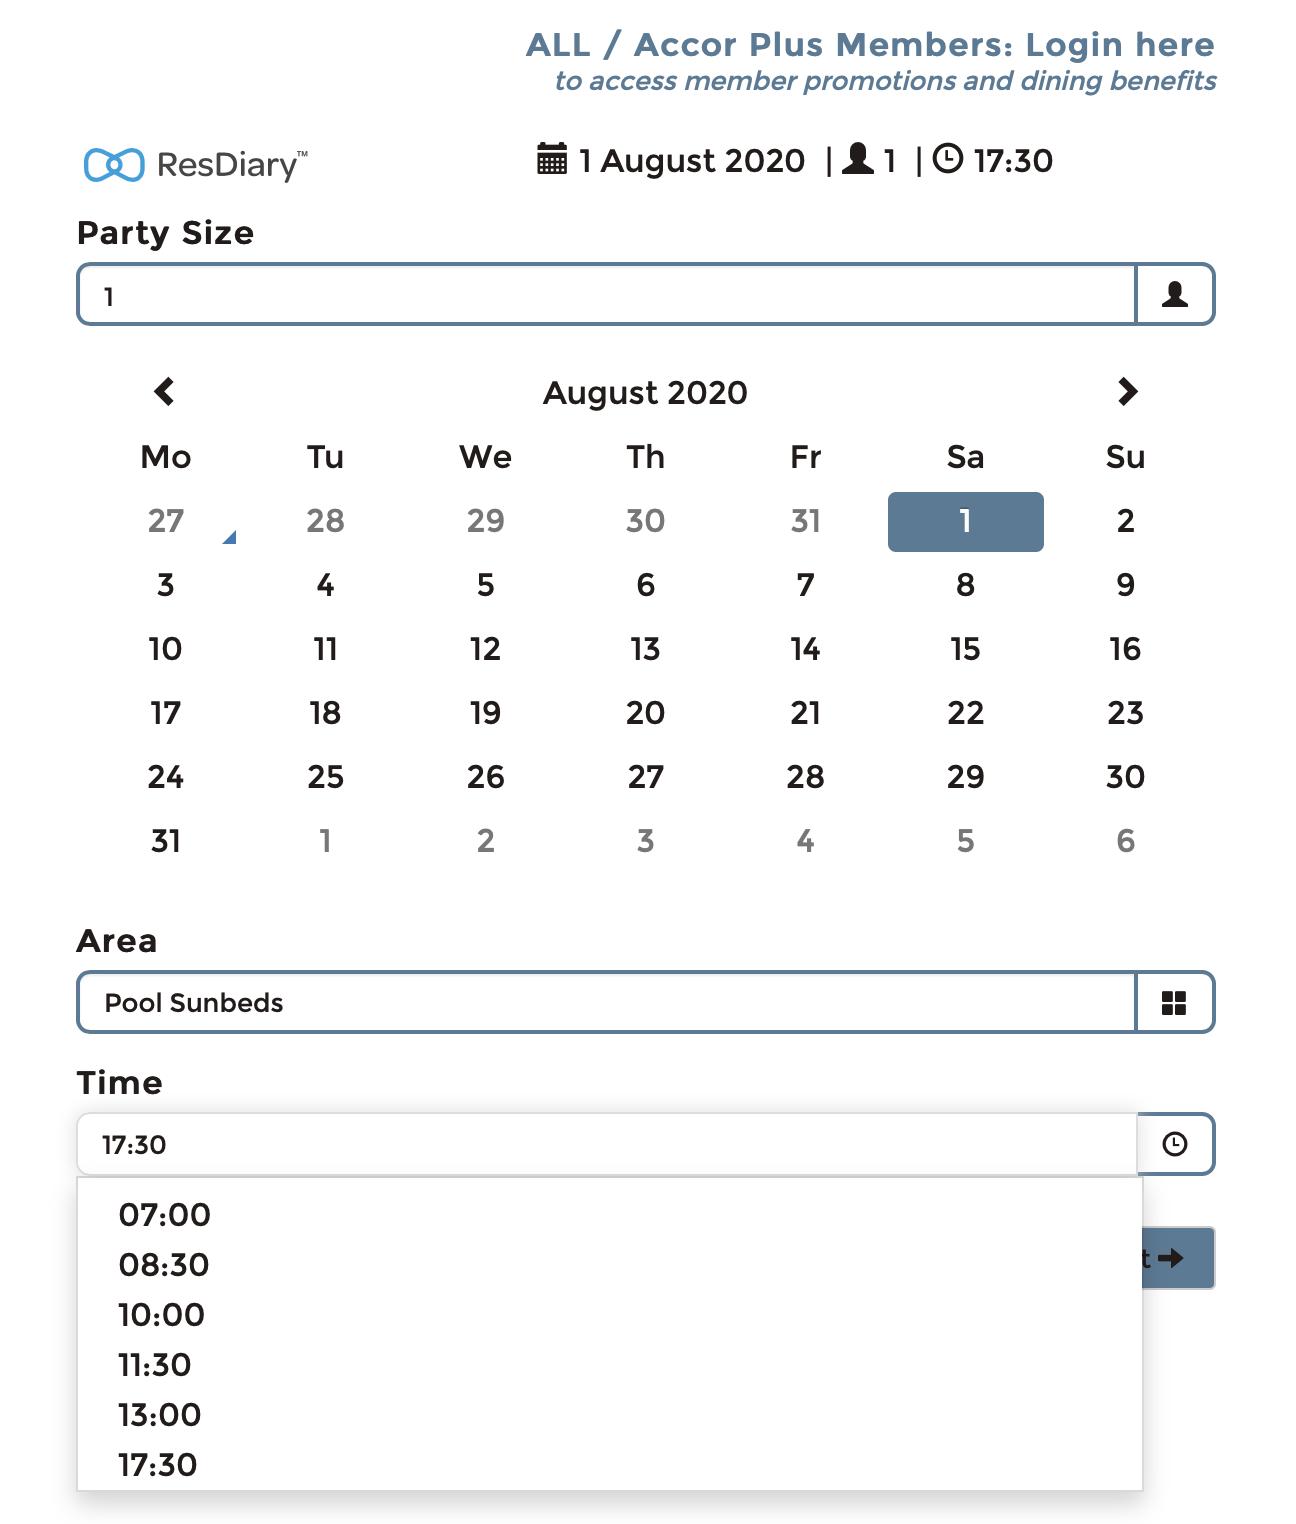 Screenshot 2020-07-27 at 12.00.52 PM